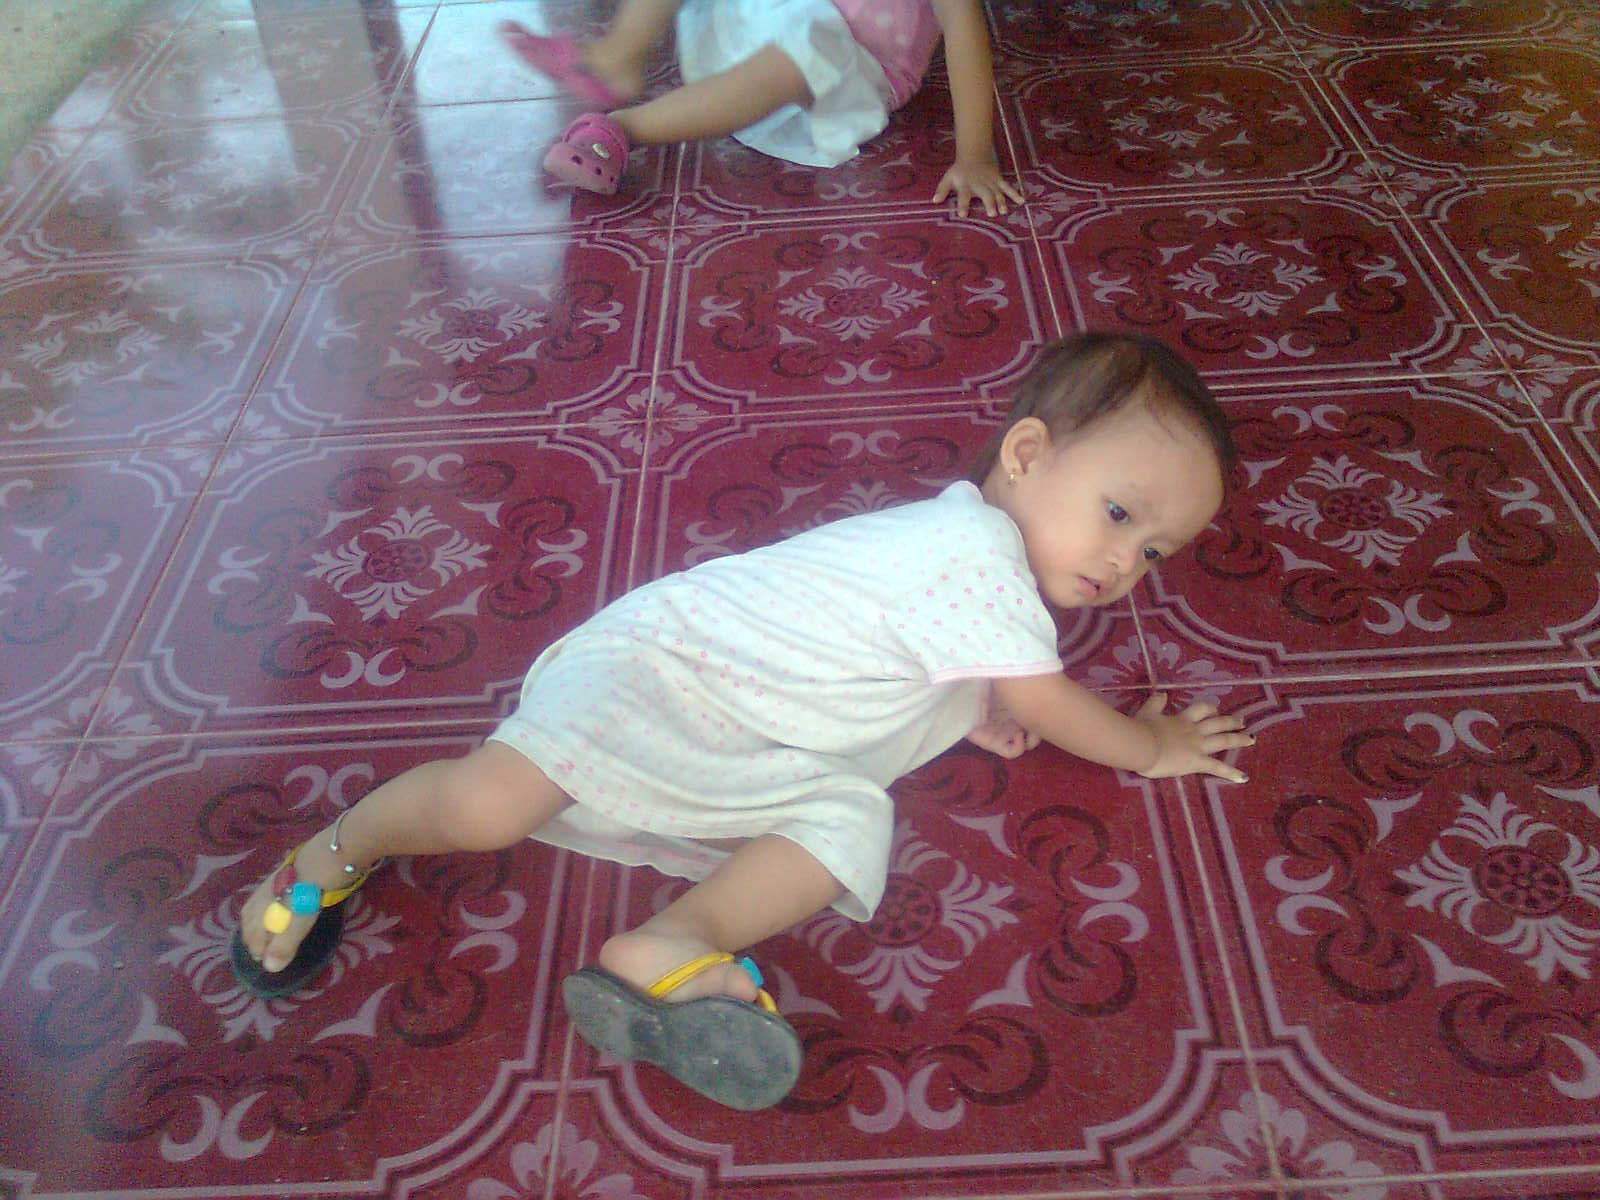 Anak Anak Lucu Dari Gorontalo 8 NasihatGuruku